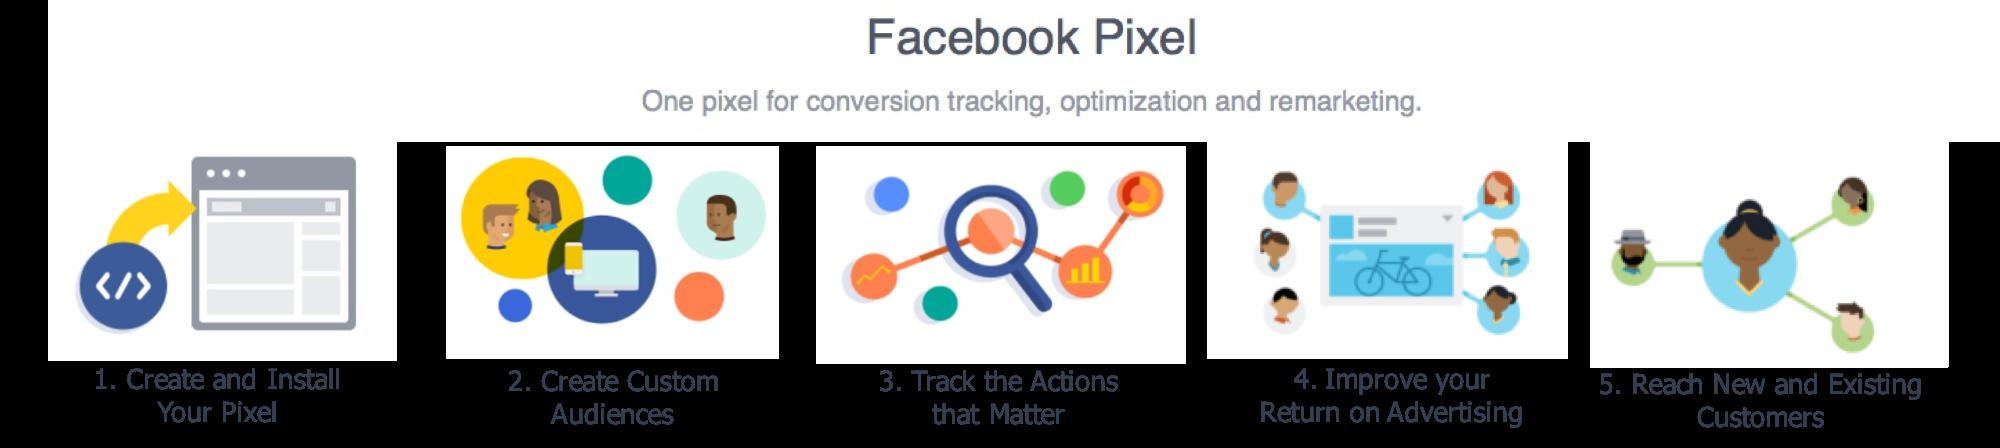 facebook-pixel-schritte